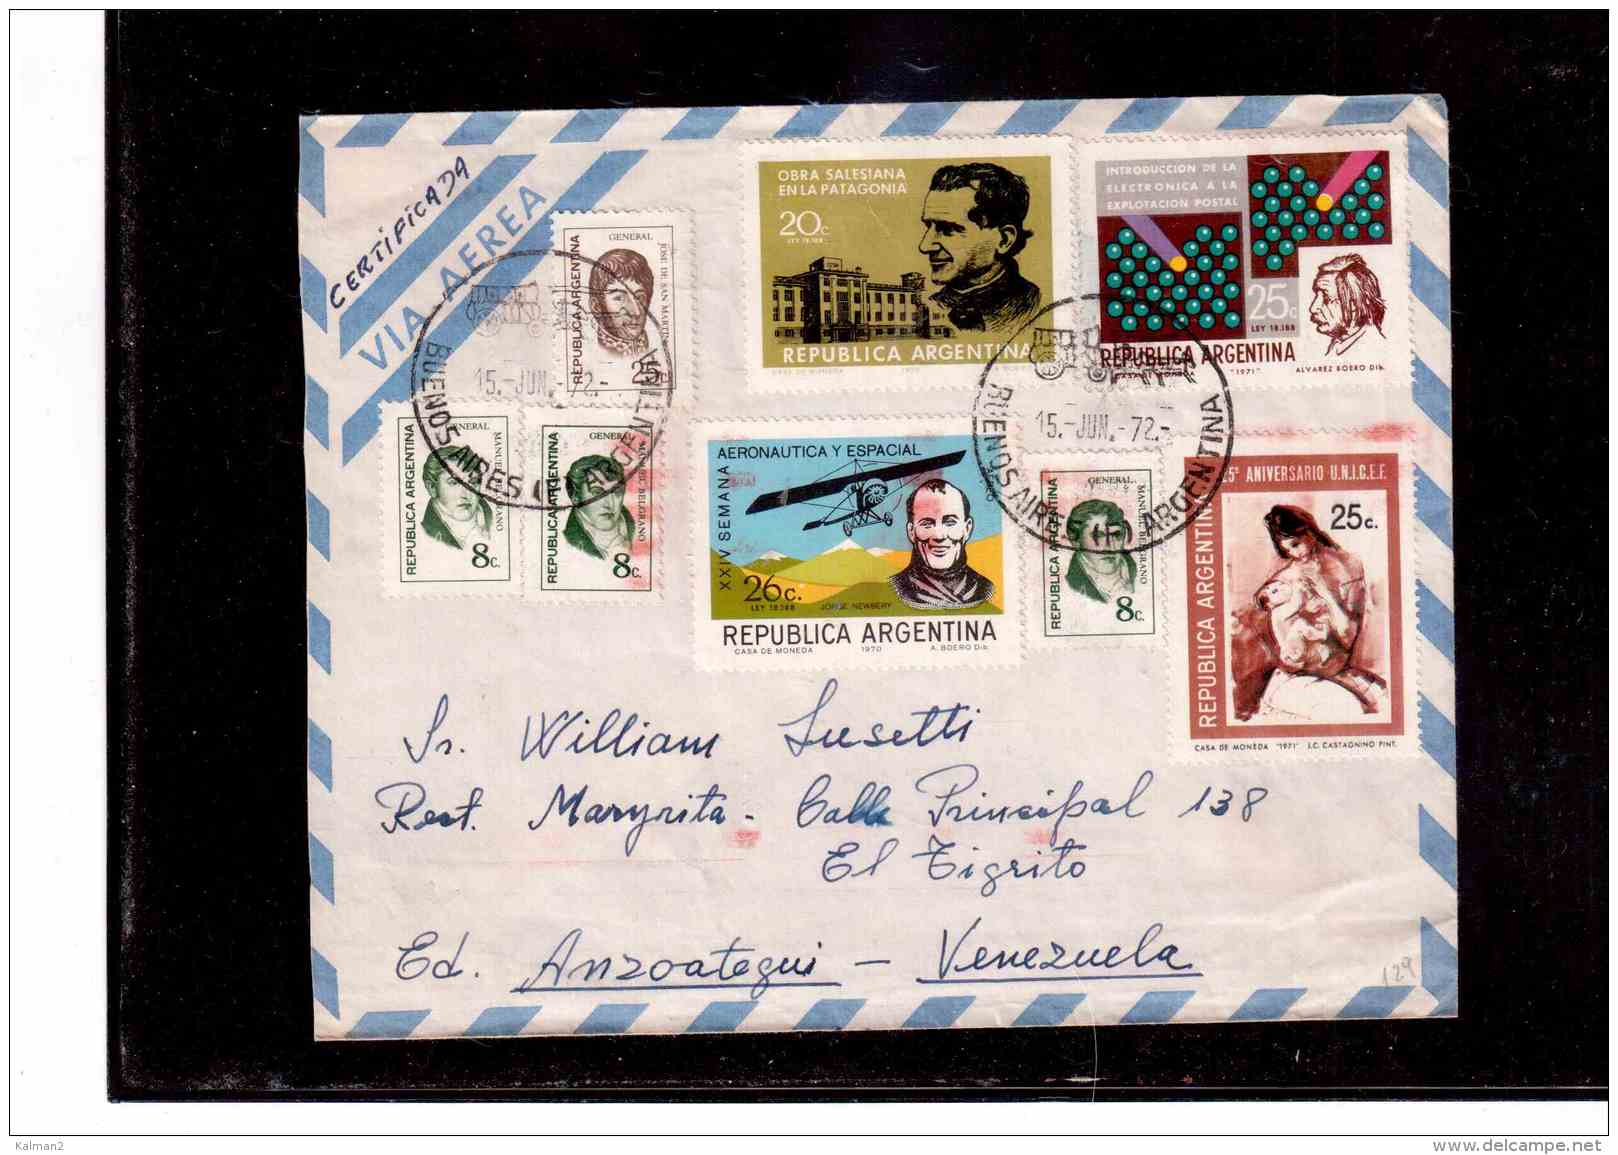 "TEM8770    -  POSTAL HISTORY    ""  ARGENTINA  ""  /     REGISTERED   AIR MAIL    LETTER  TO   VENEZUE     ON    15.6.1972 - Argentina"